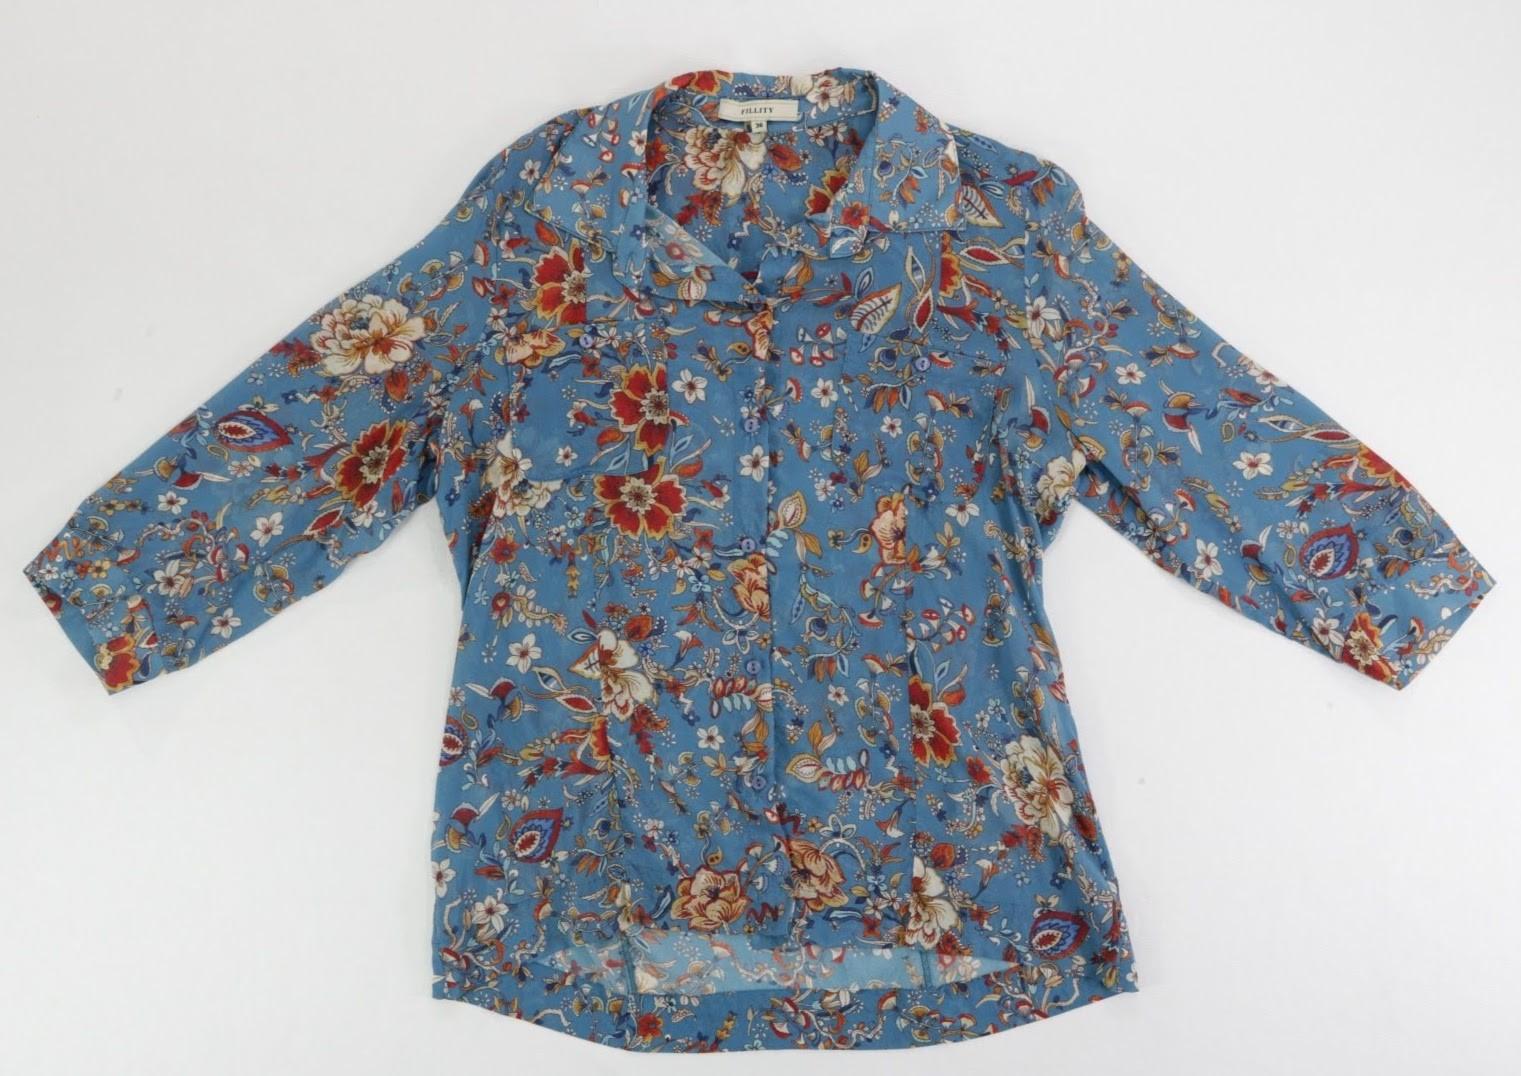 Camisa Fillity - Tam 36